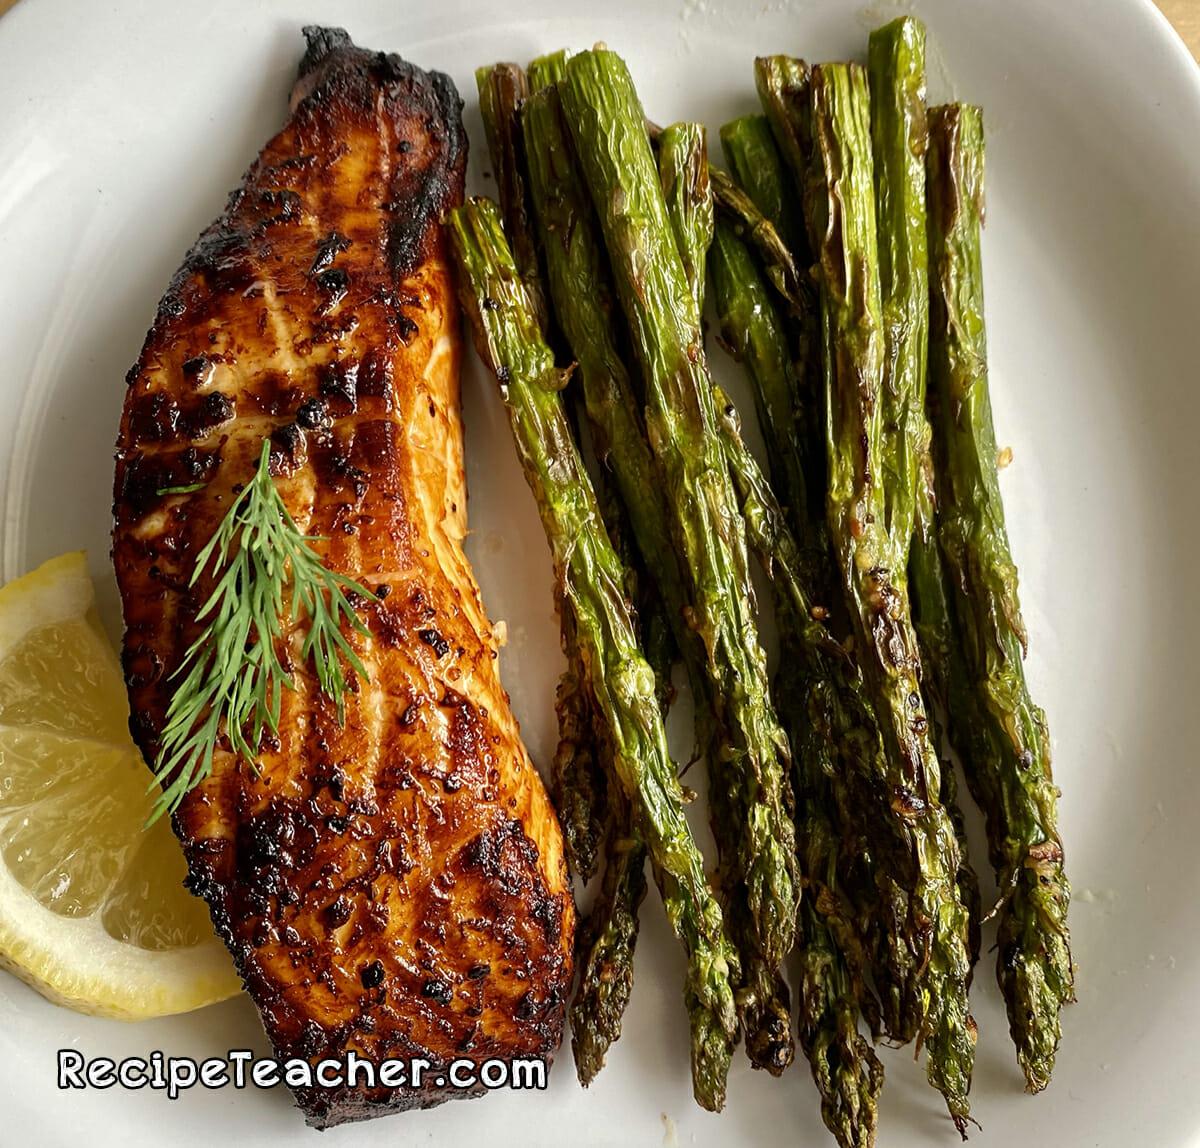 Air fryer citrus garlic salmon served with asparagus.